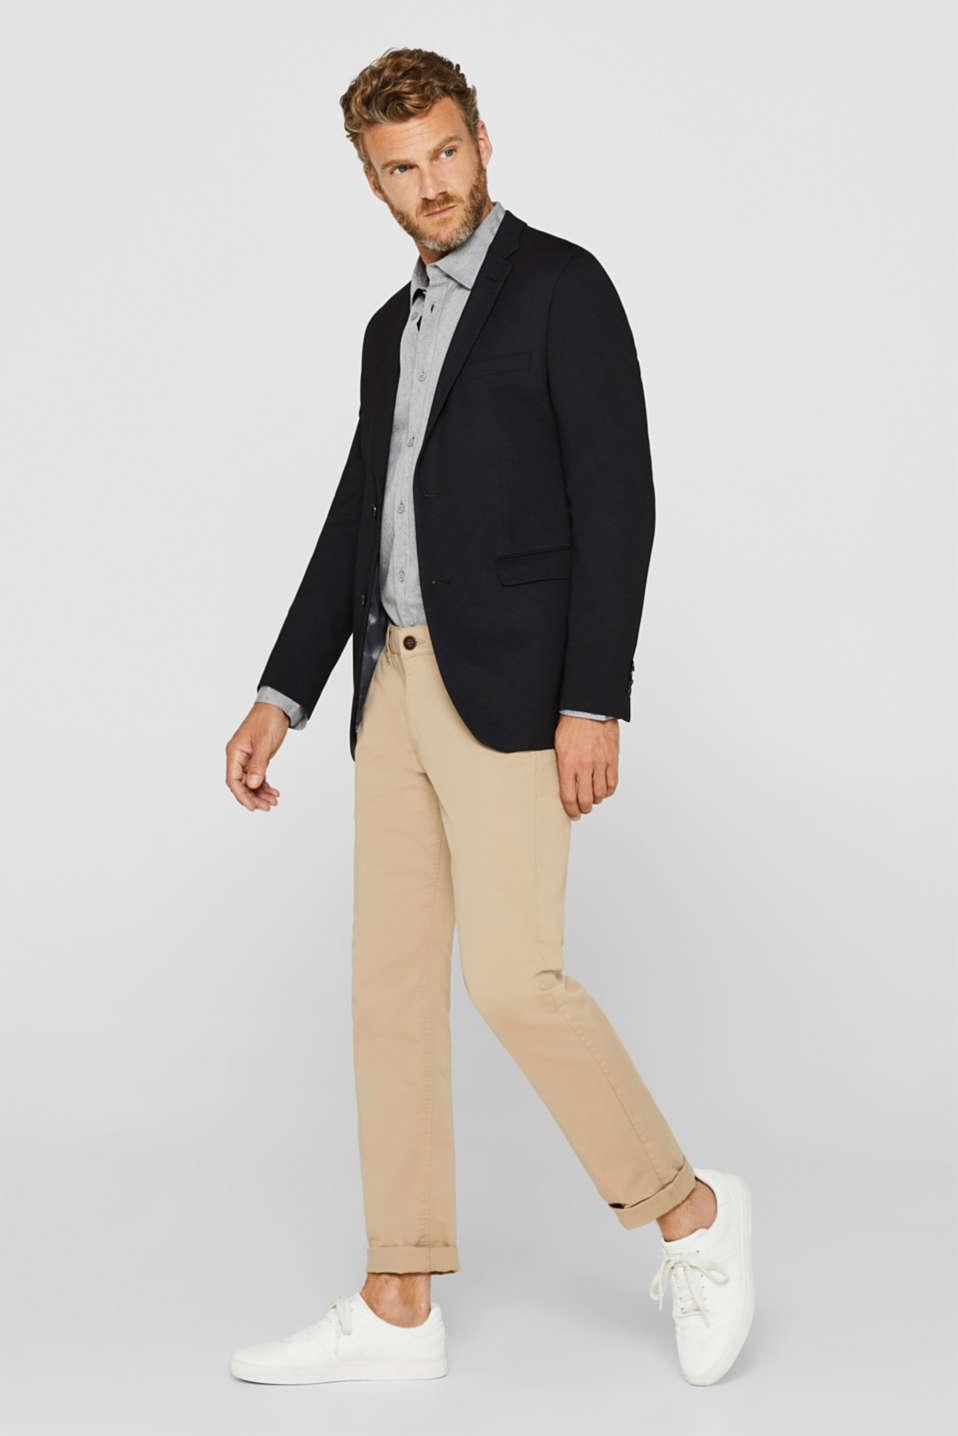 Blazers suit, BLACK, detail image number 1